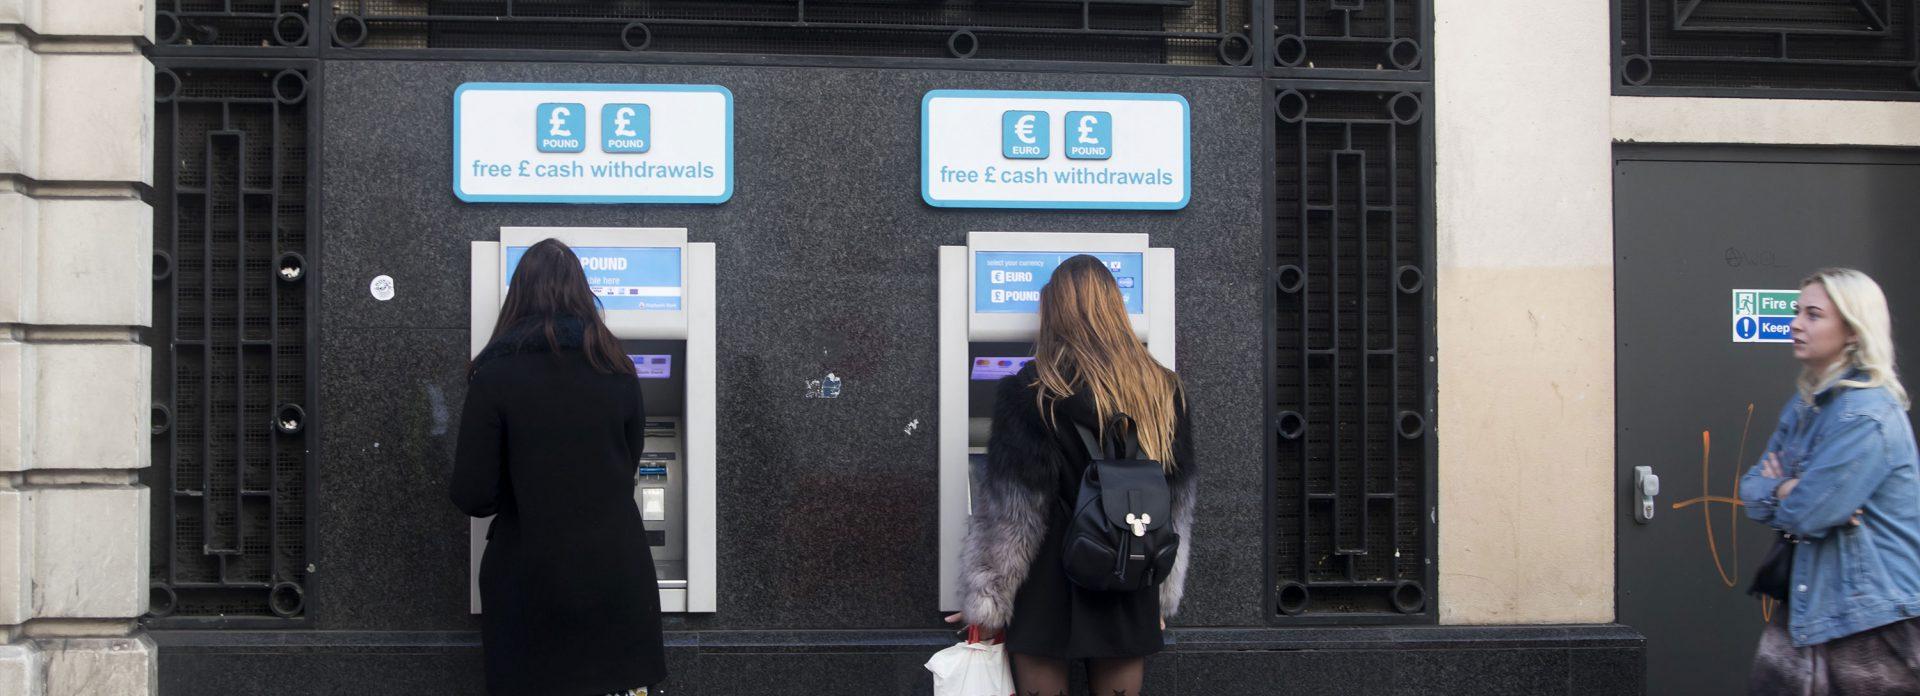 bank minibank England London ta ut penger atm